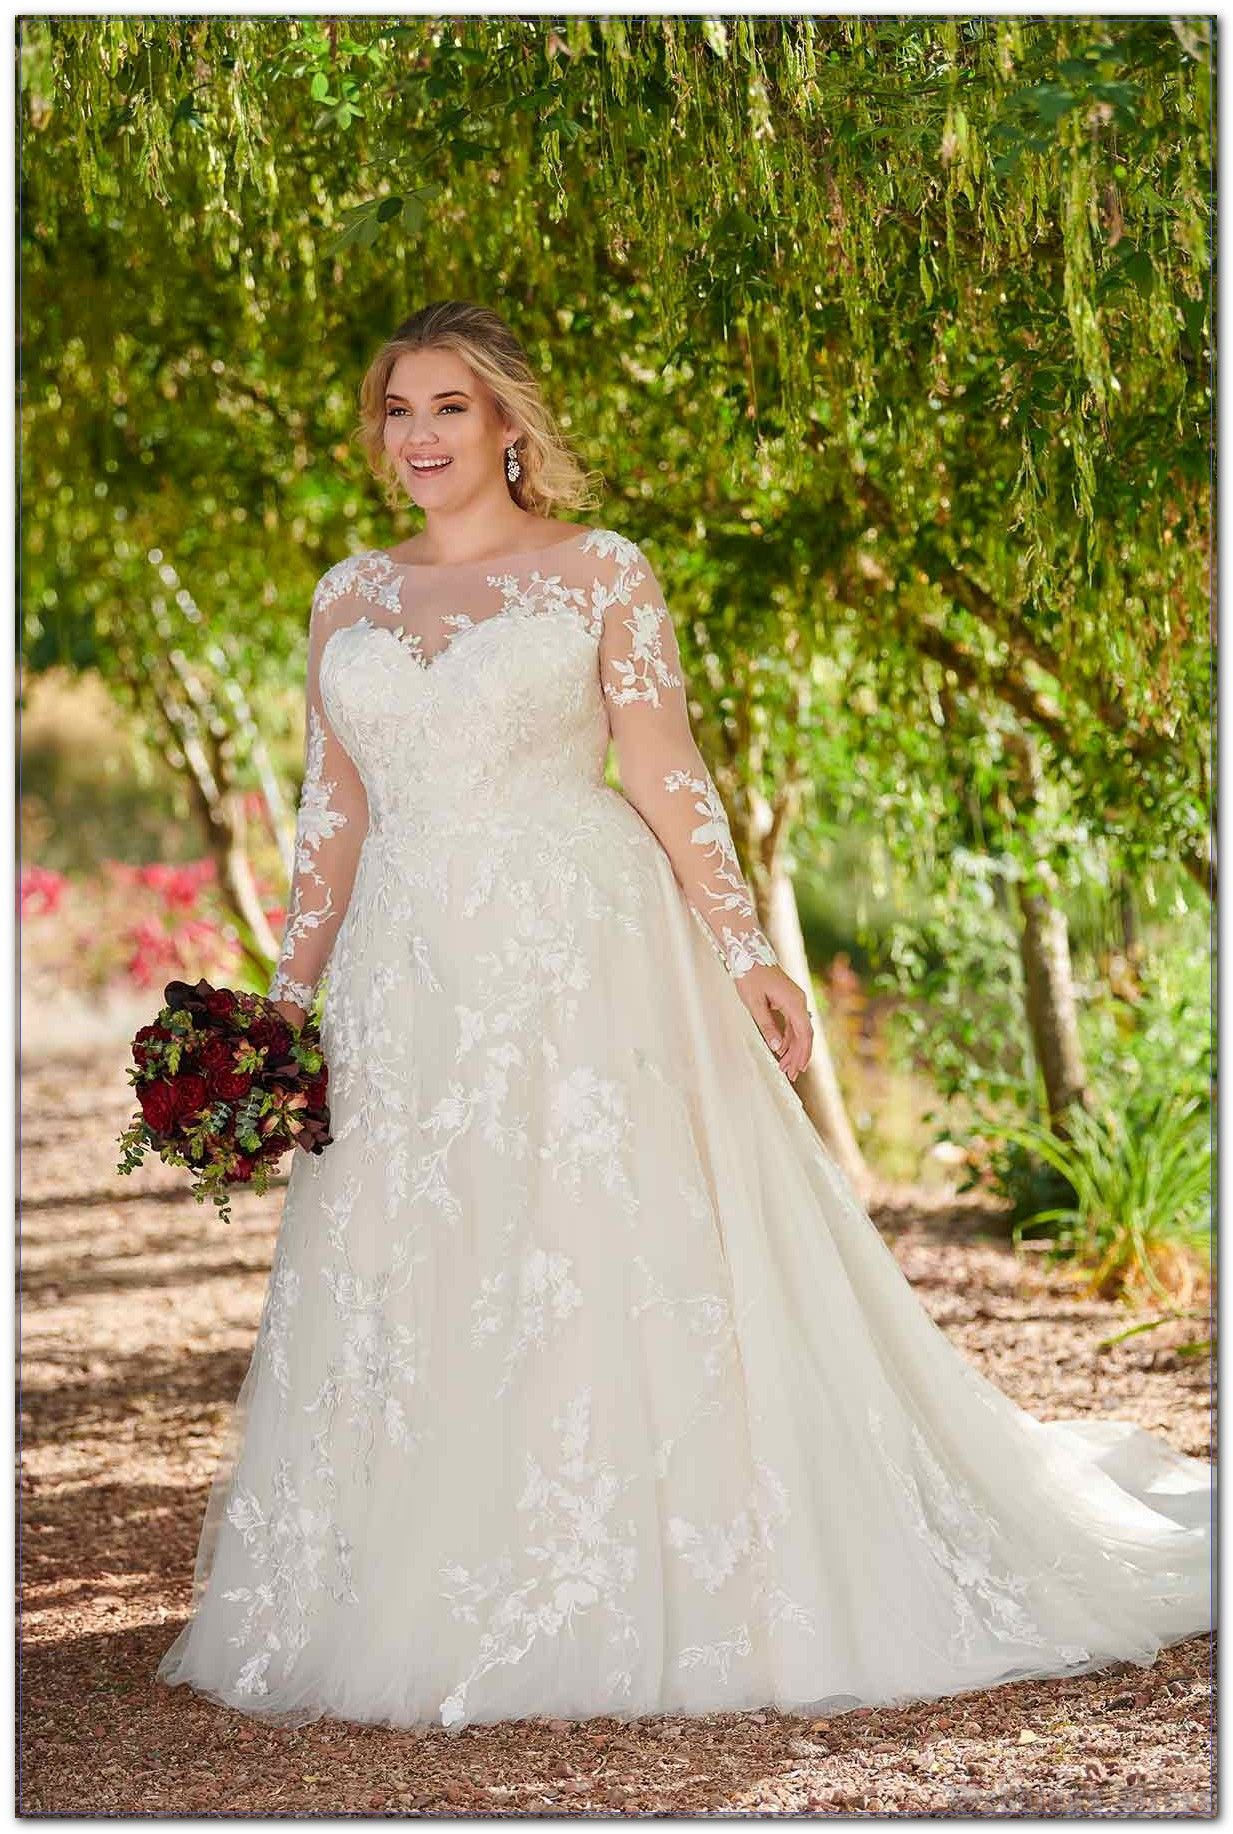 Why Most Weddings Dress Fail